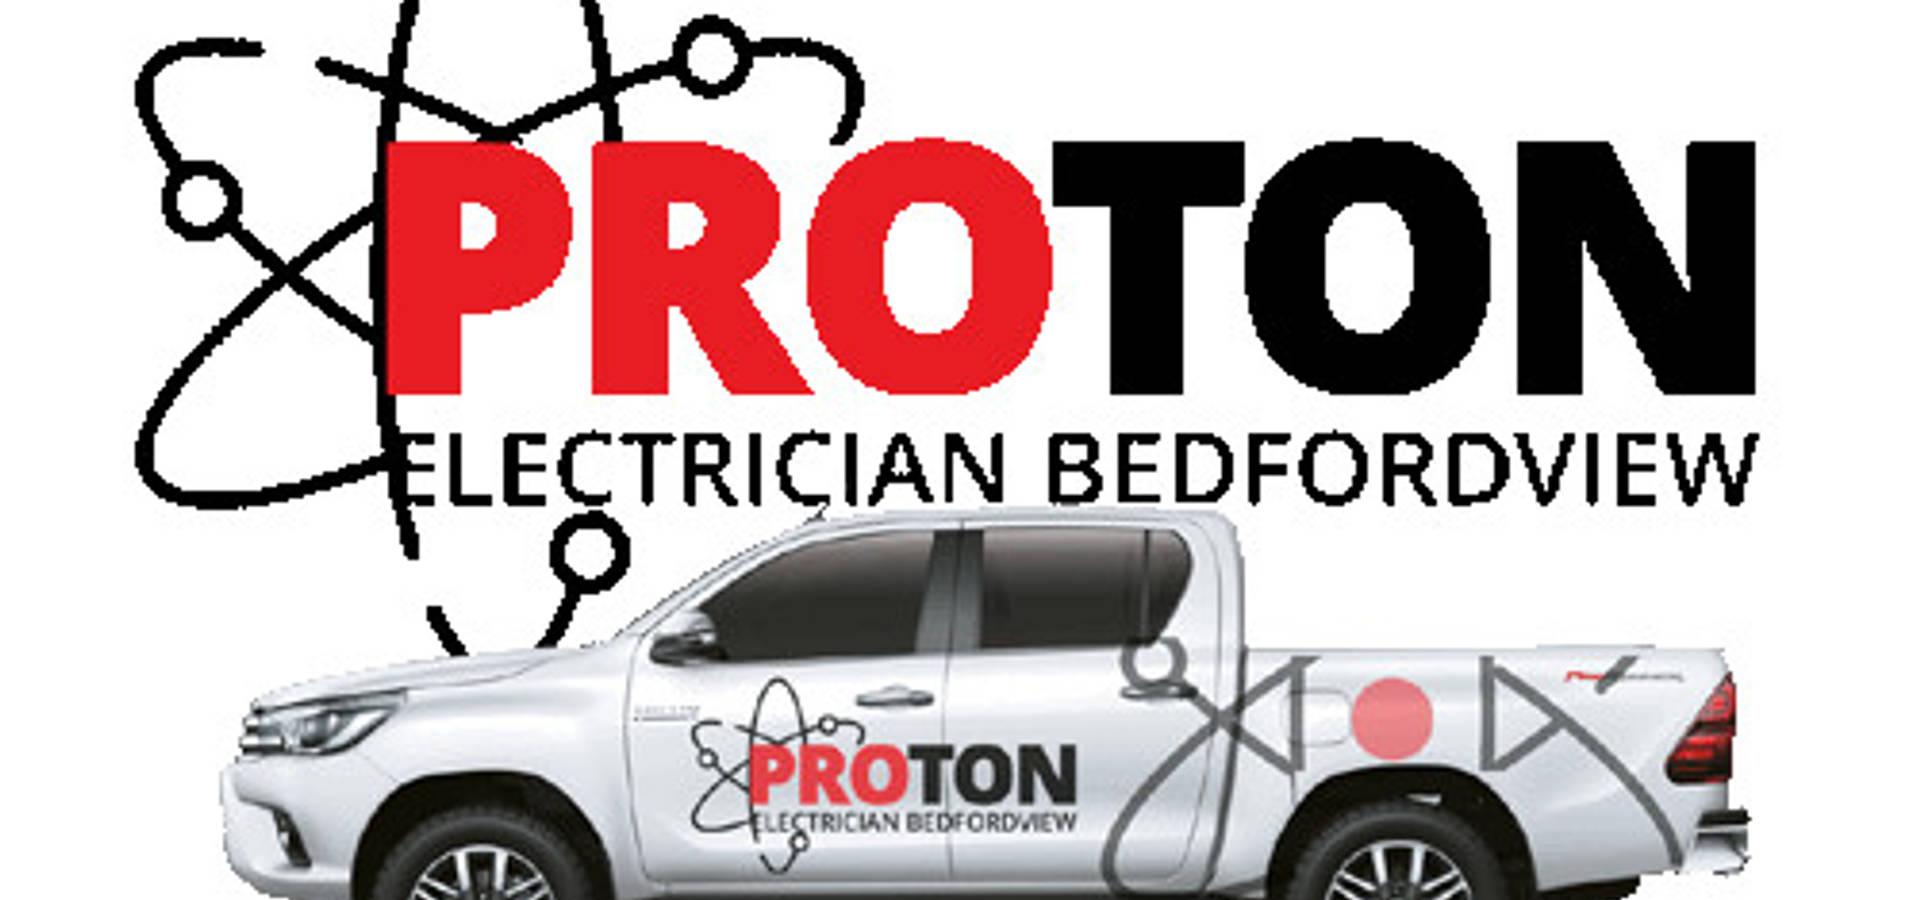 Electrician Bedfordview